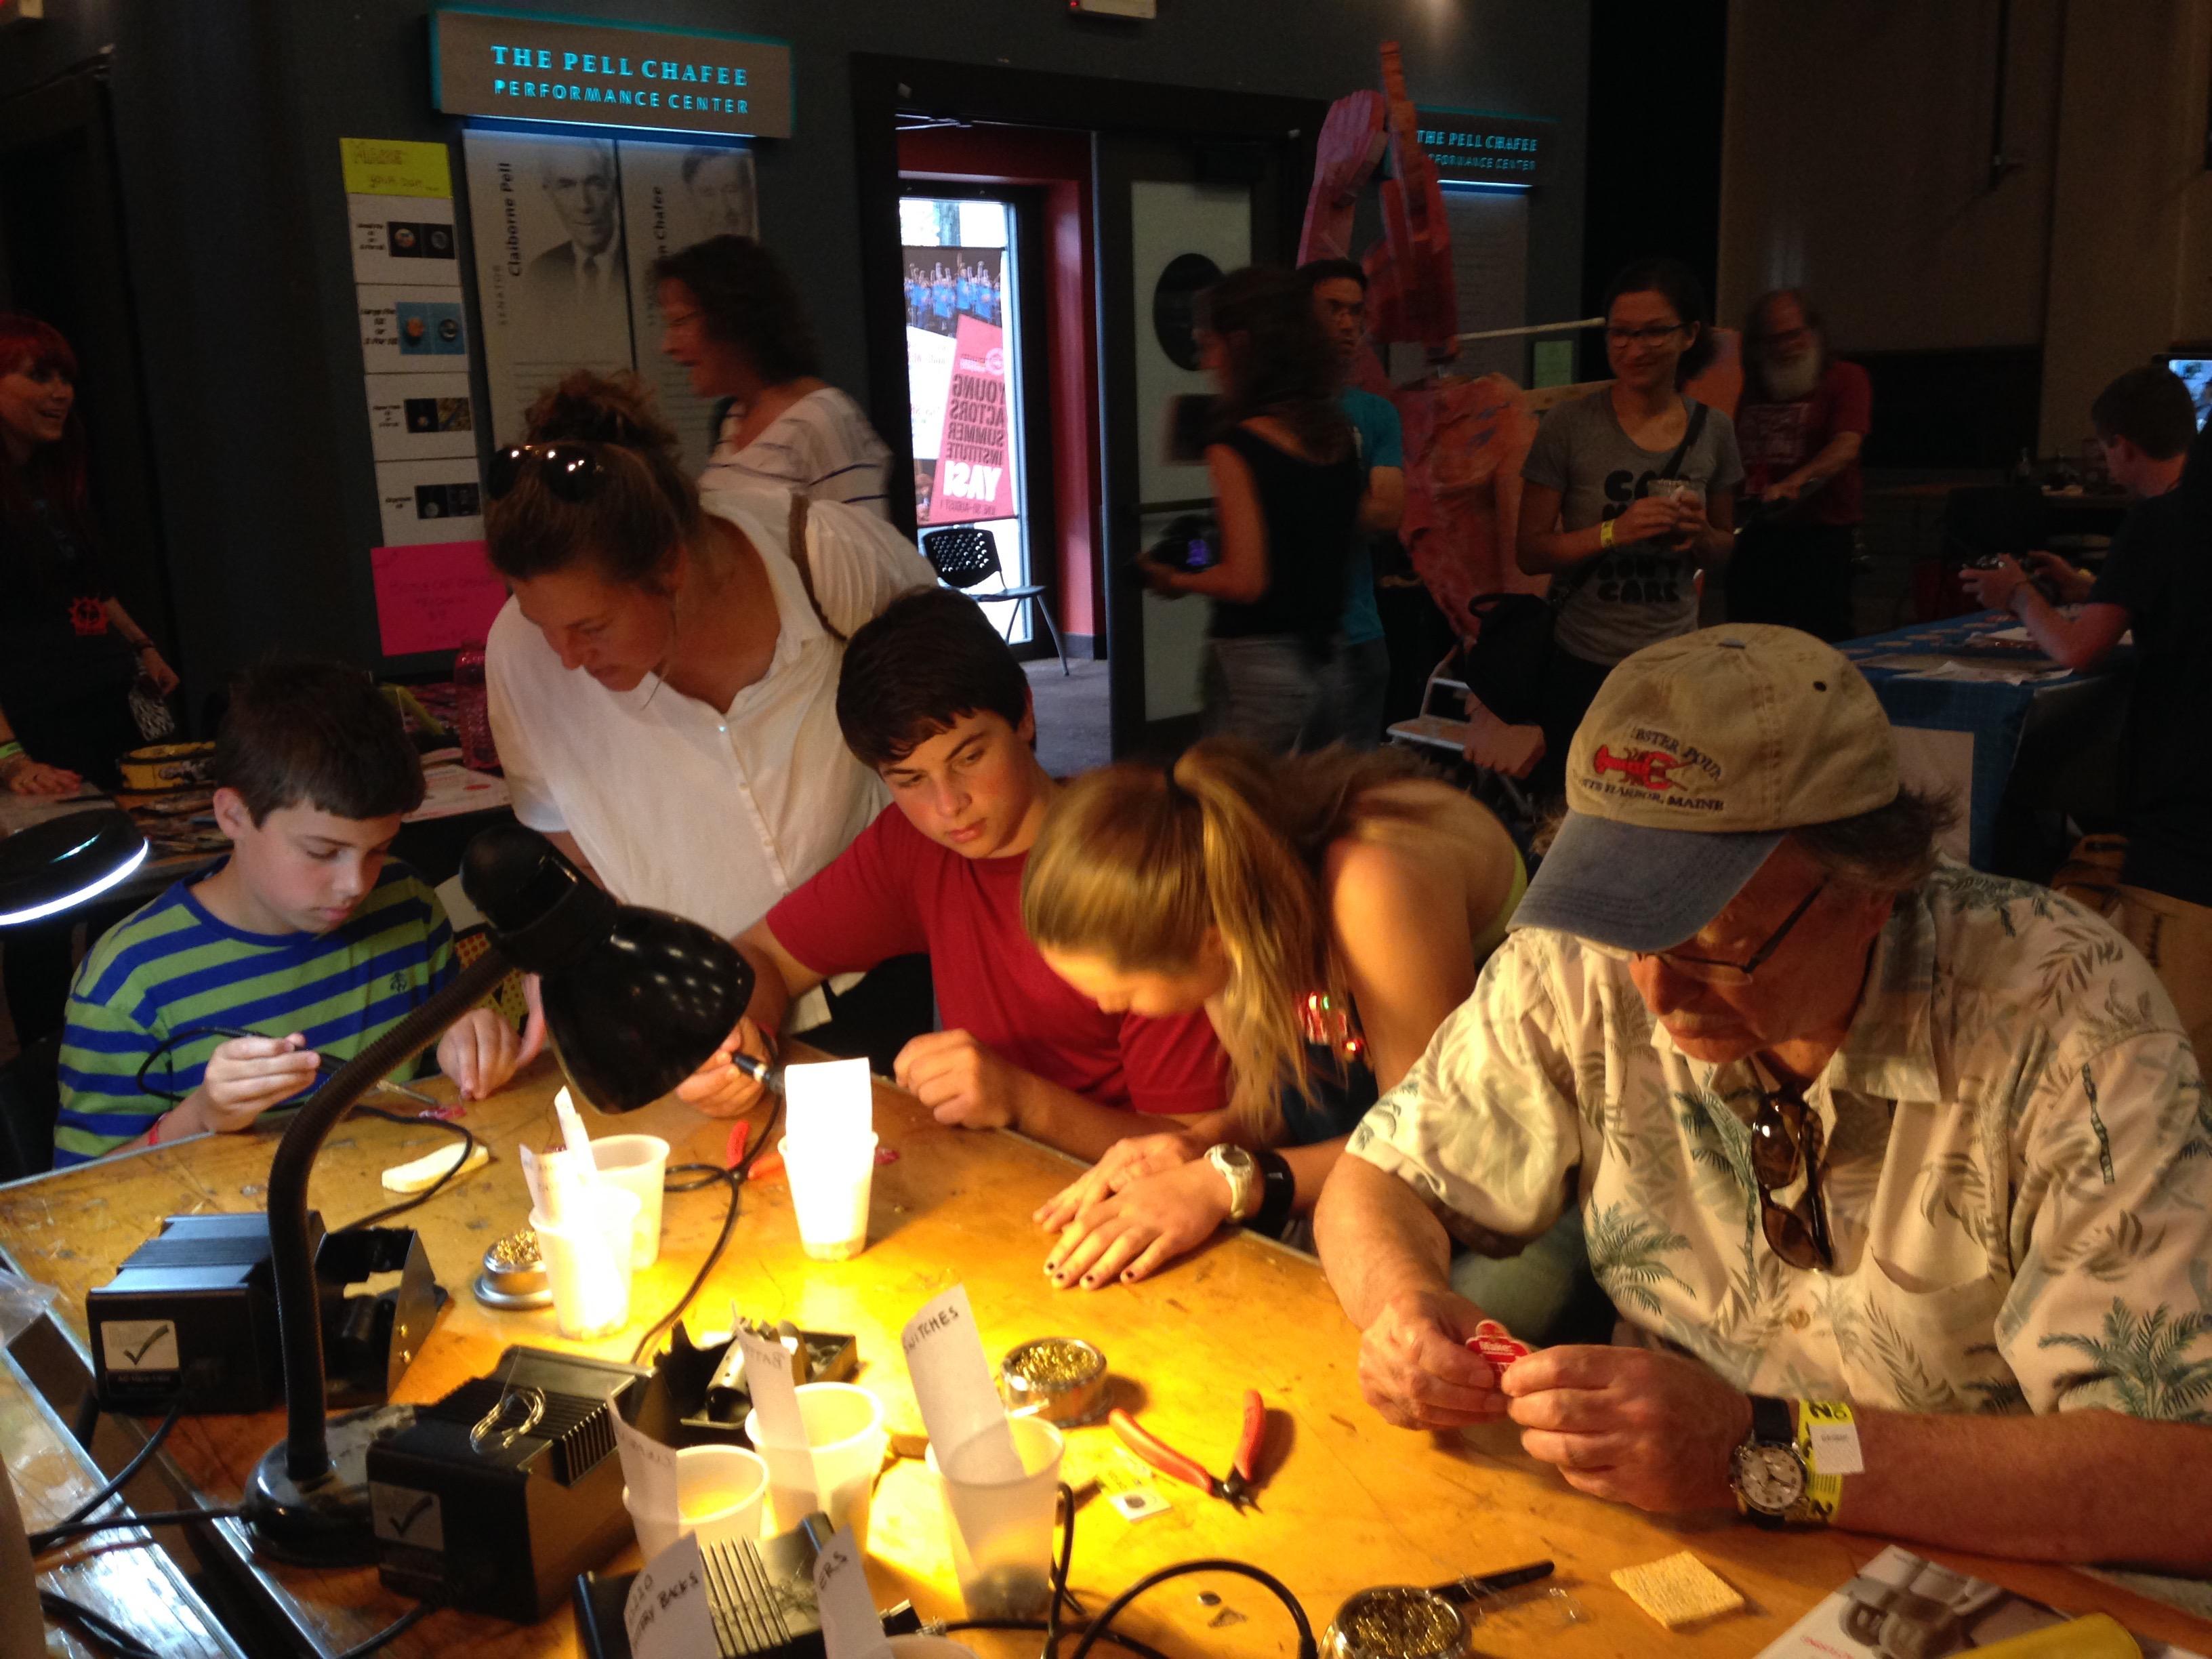 2015 RI Mini Maker Faire Photo by Mary Johnson